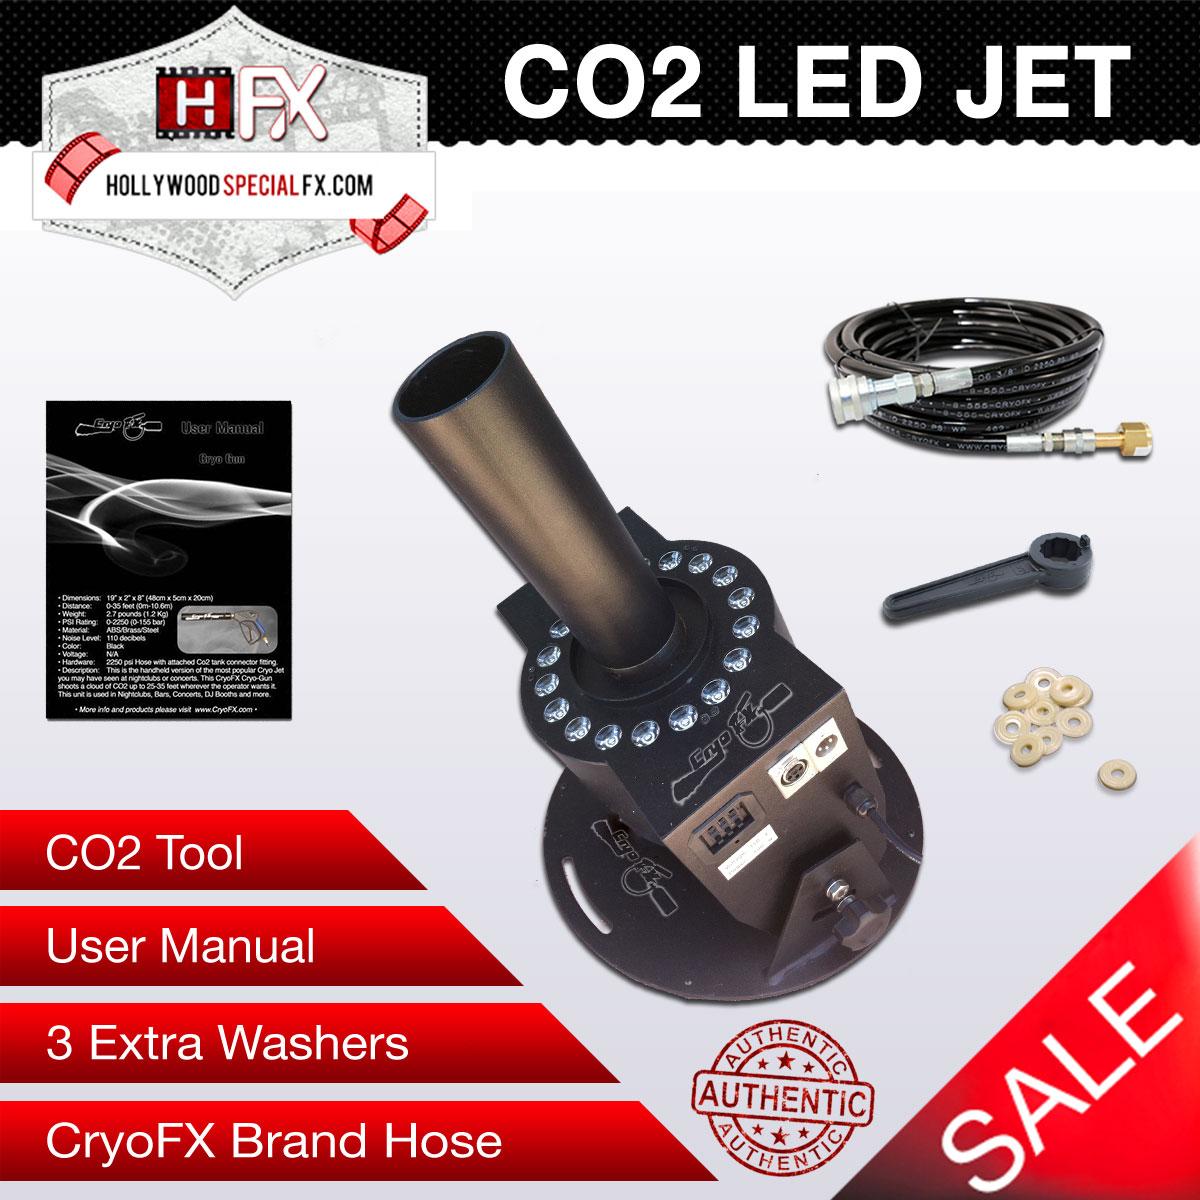 CO2 LED Jet